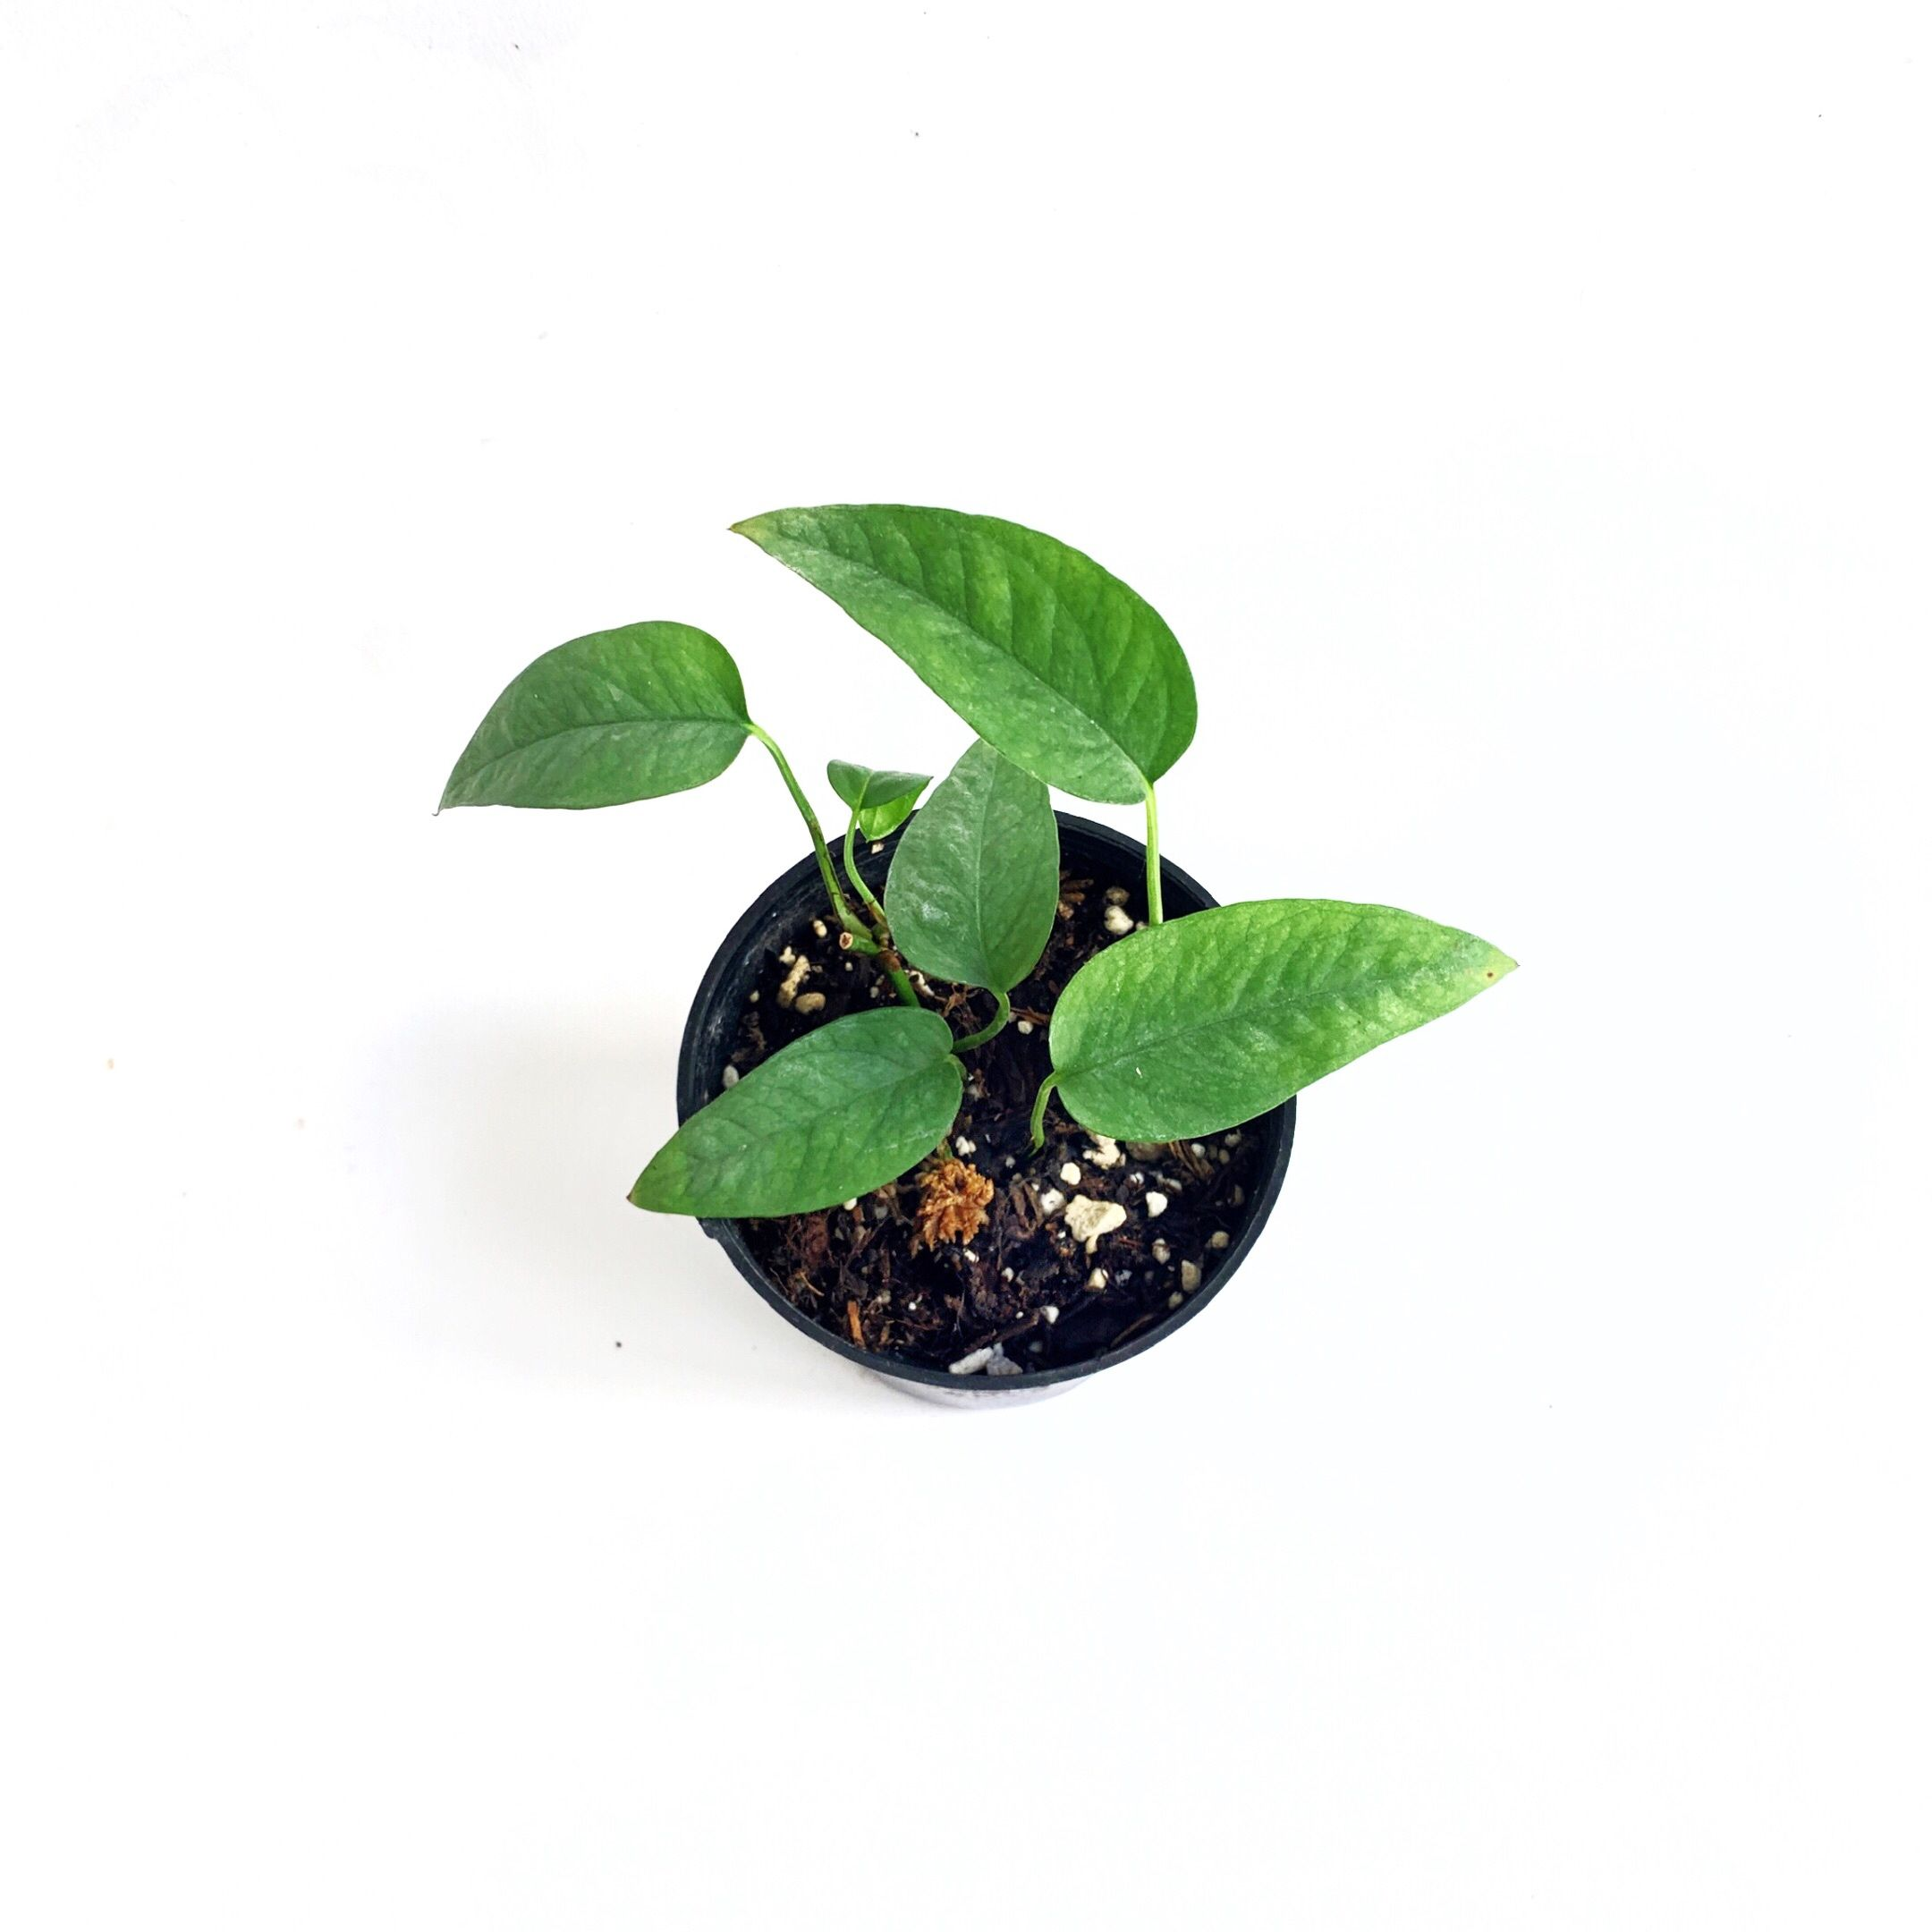 #cebublue #pothos #trailingplants #plantshop #LAplantshop #DTLAshop #LAshop #shopsmall #shoplocal  #plantsale #plantcommunity #houseplantcommunity #epipremnumpinnatum #plantparenthood #planthoarder #flauntyourleaves  #coolplantkids #houseplantplantclub #houseplant  #urbanjunglebloggers #plantenabler #plantbased #plantcare #urbangardening #Plantlady #plantlover #plantnerd #plantlife #minimalist